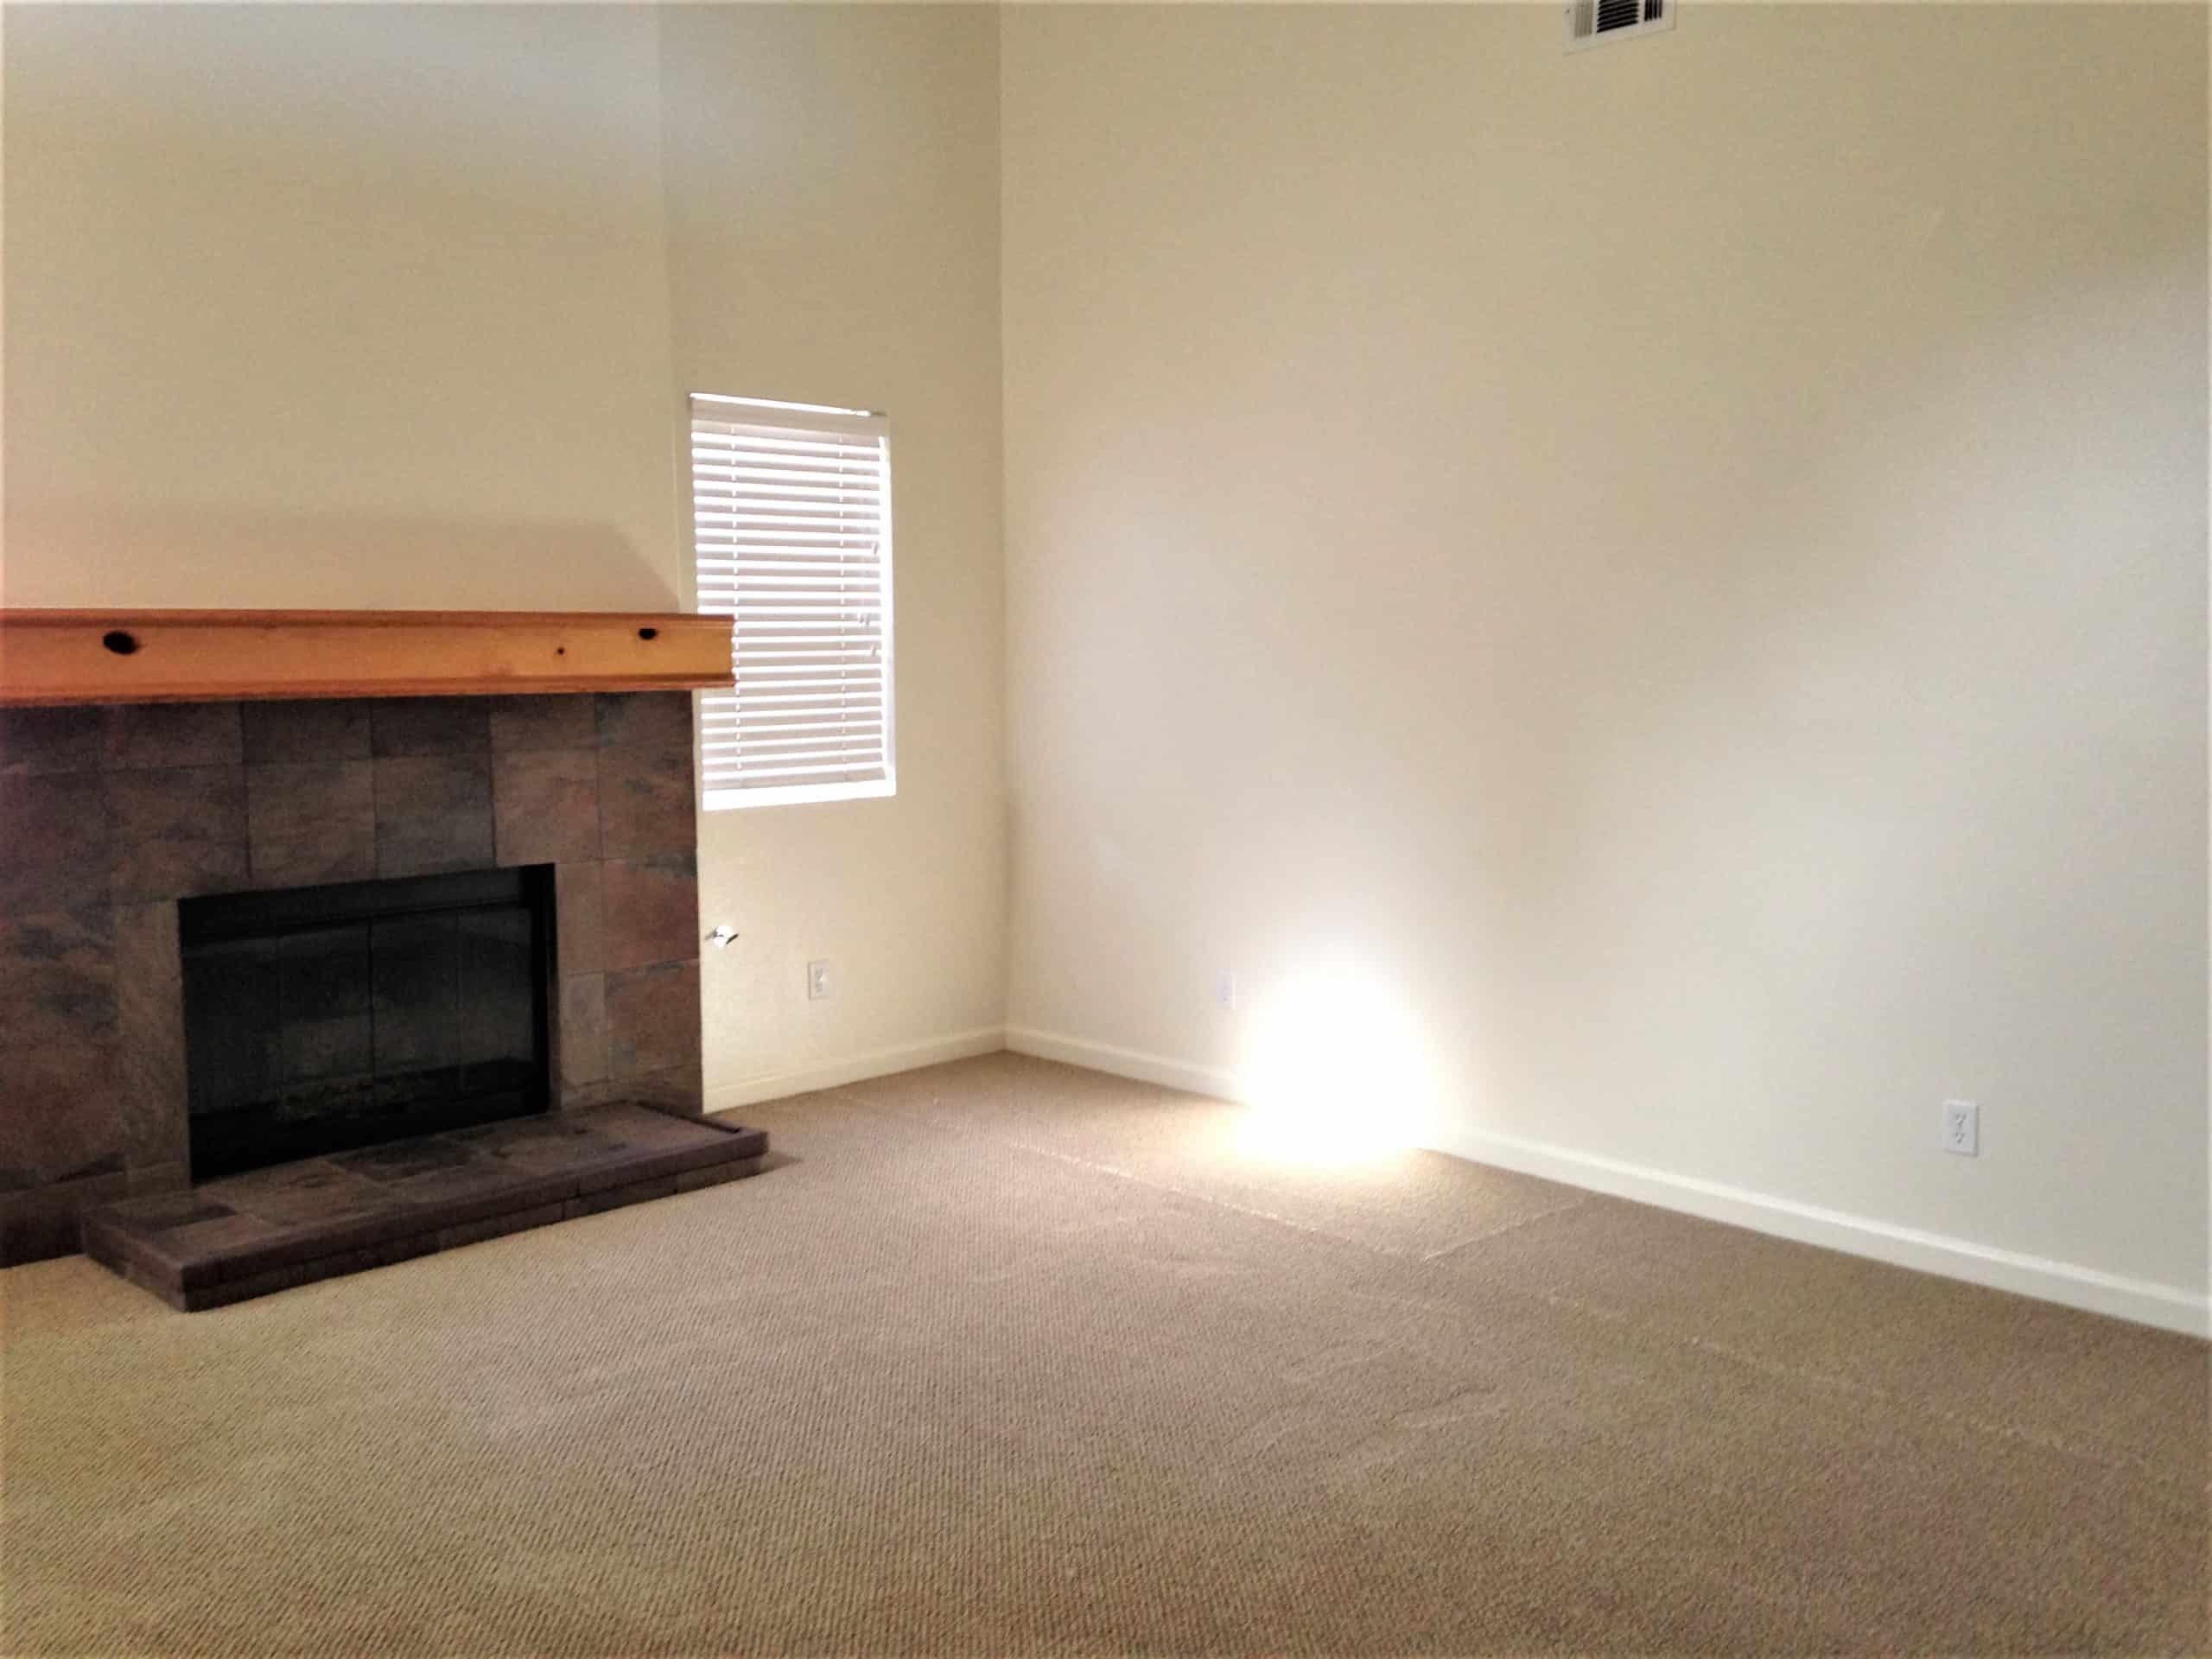 Living Room - Fireplace